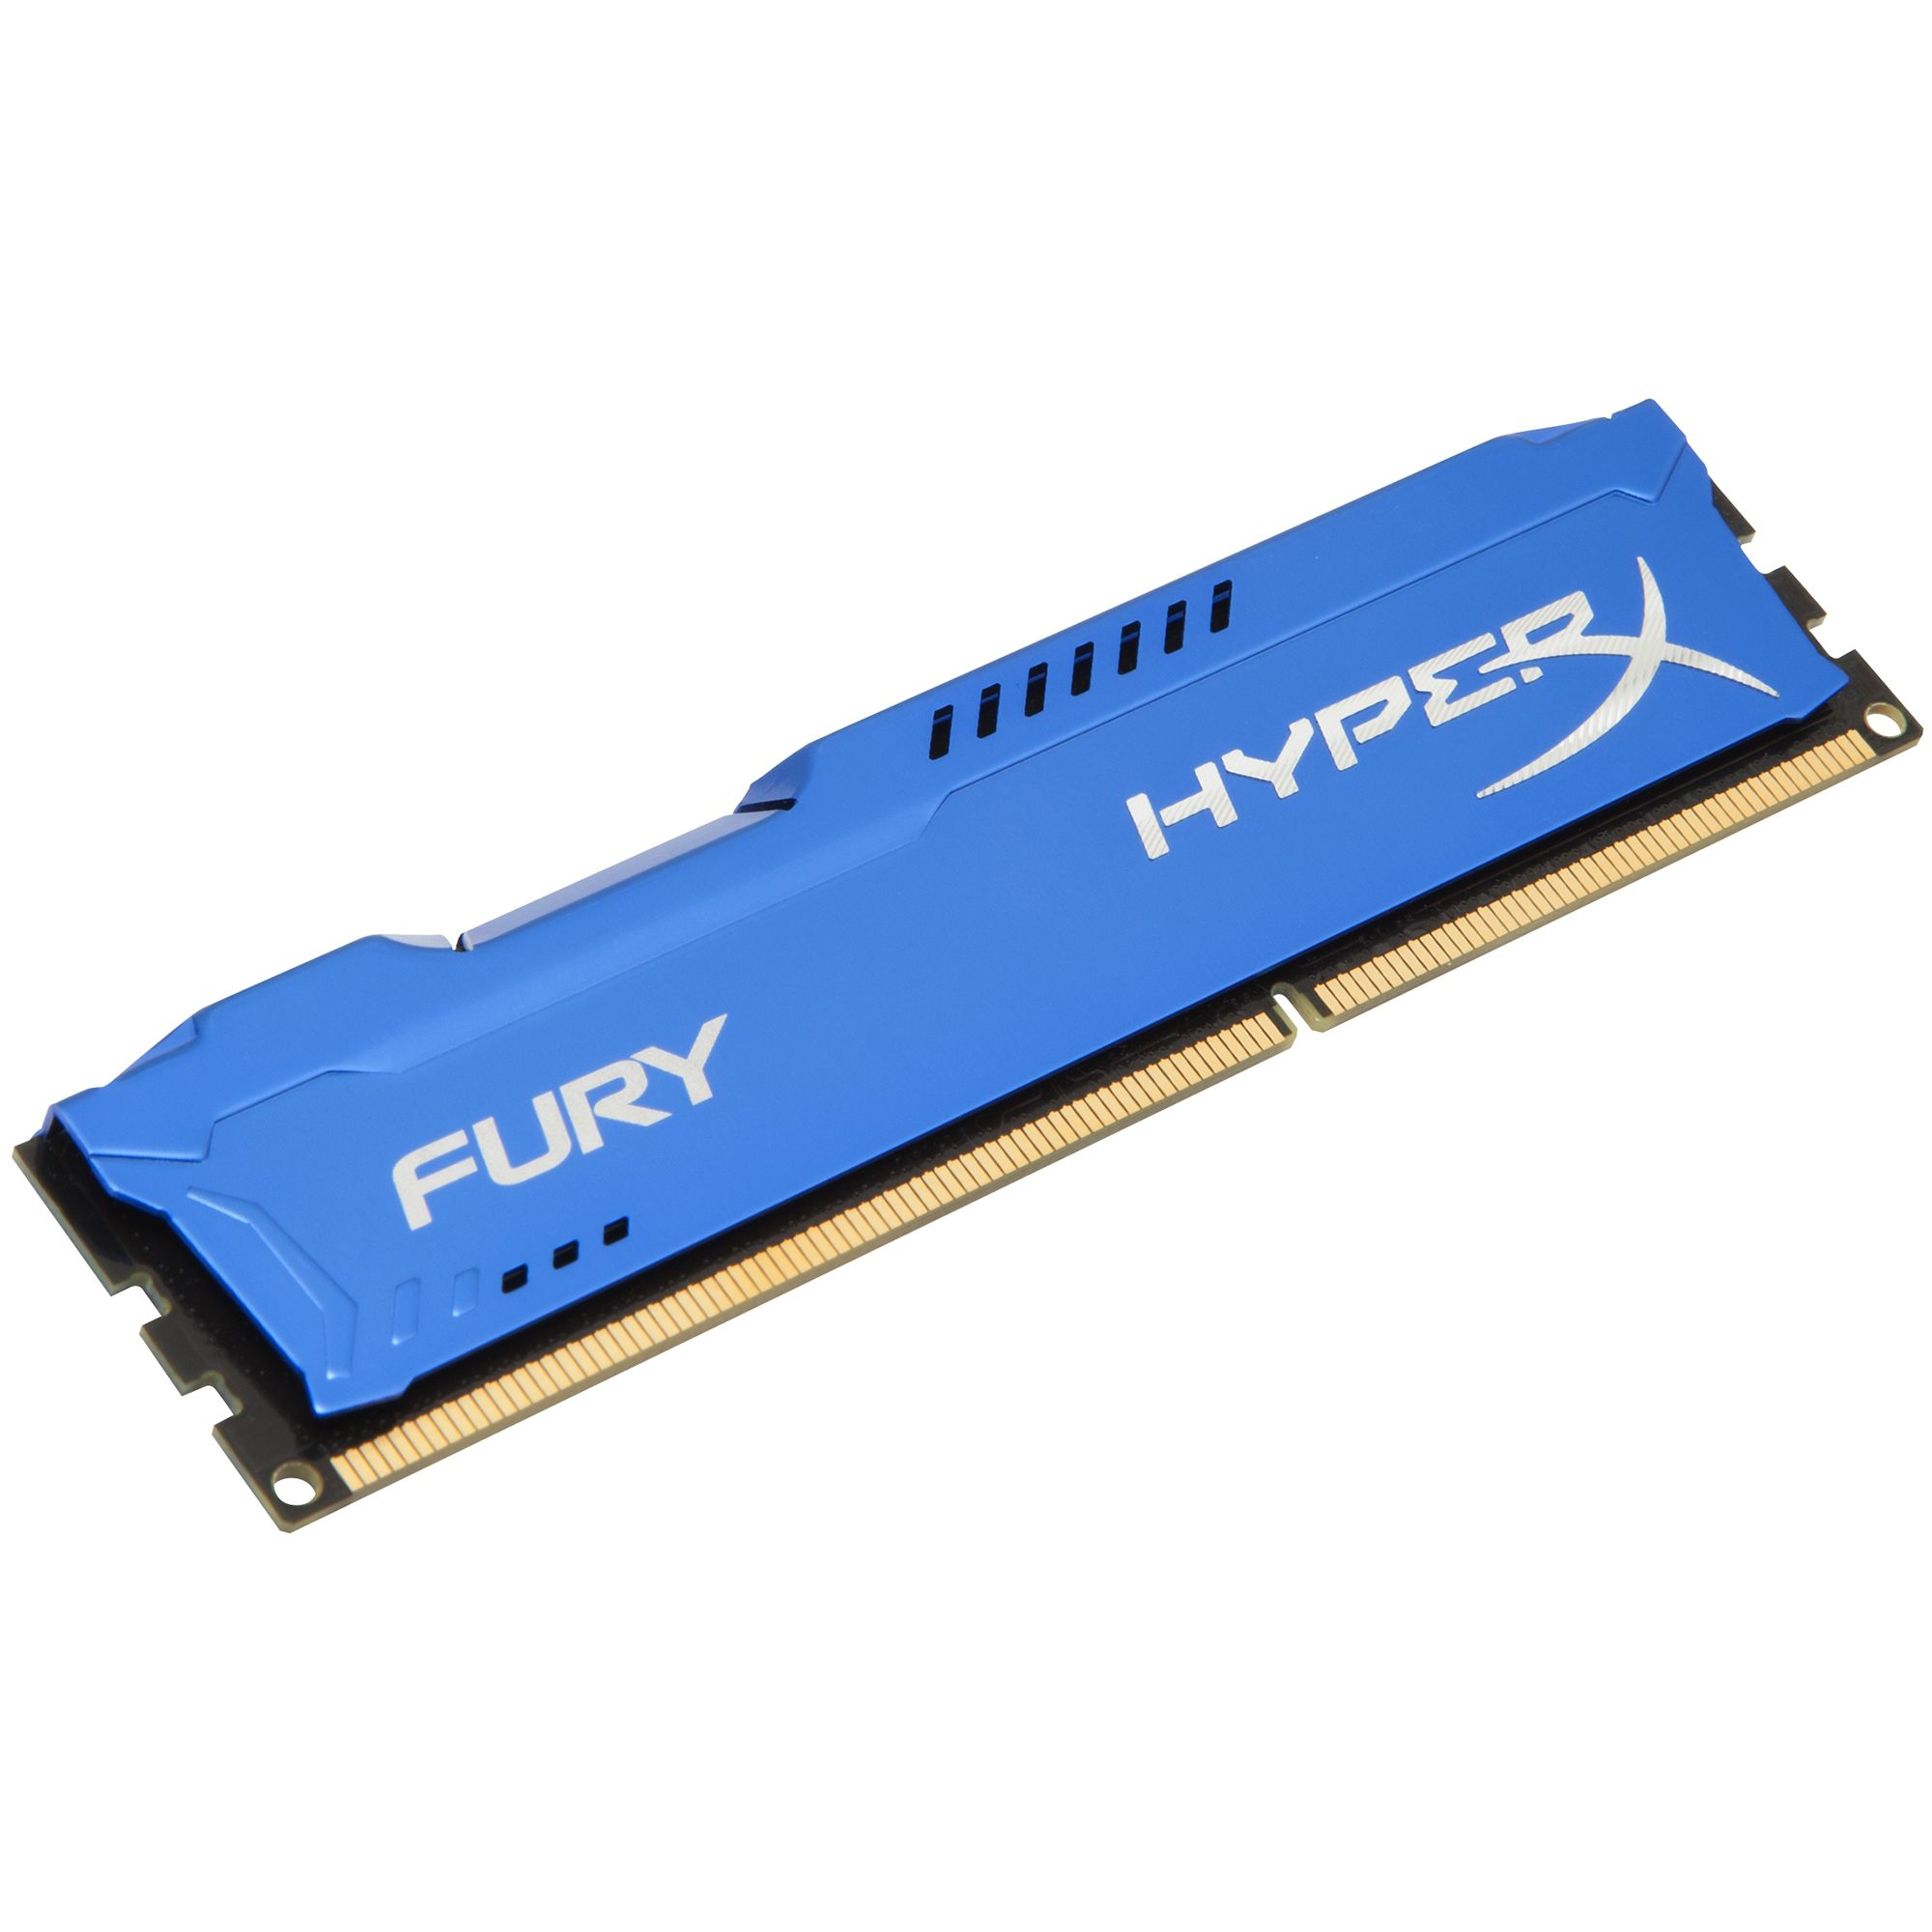 Memorie RAM Fury HyperX 4 GB DDR3